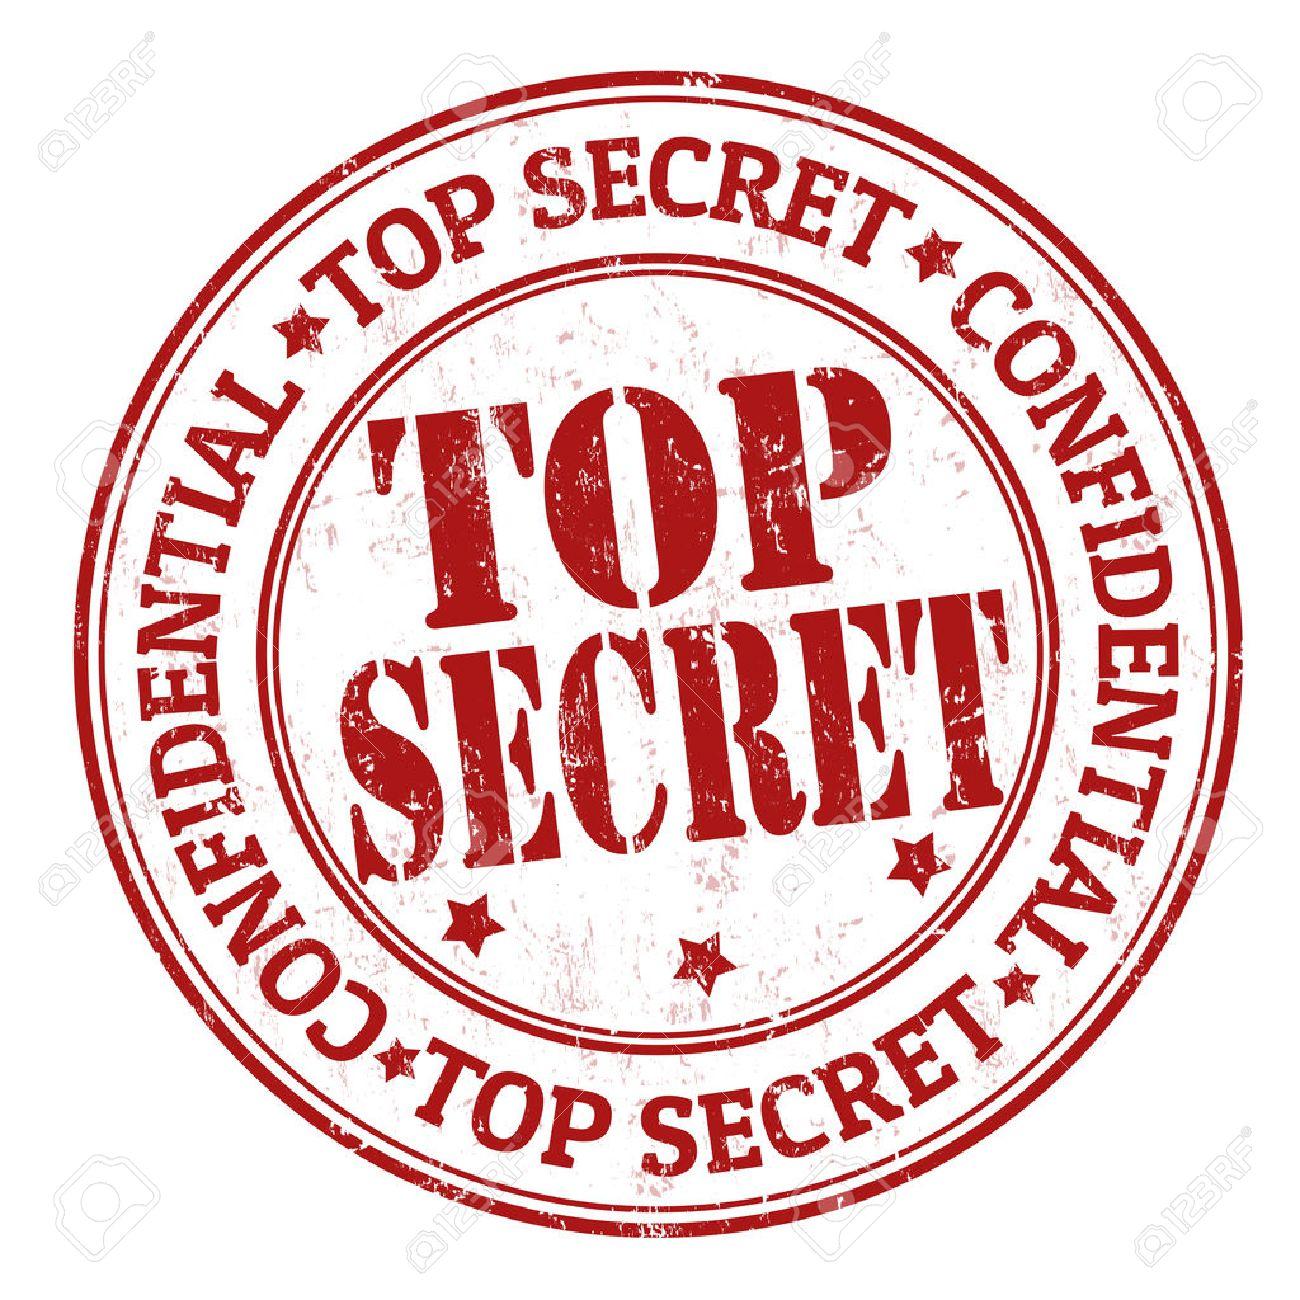 Top secret grunge rubber stamp on white, vector illustration Stock Vector - 23975592